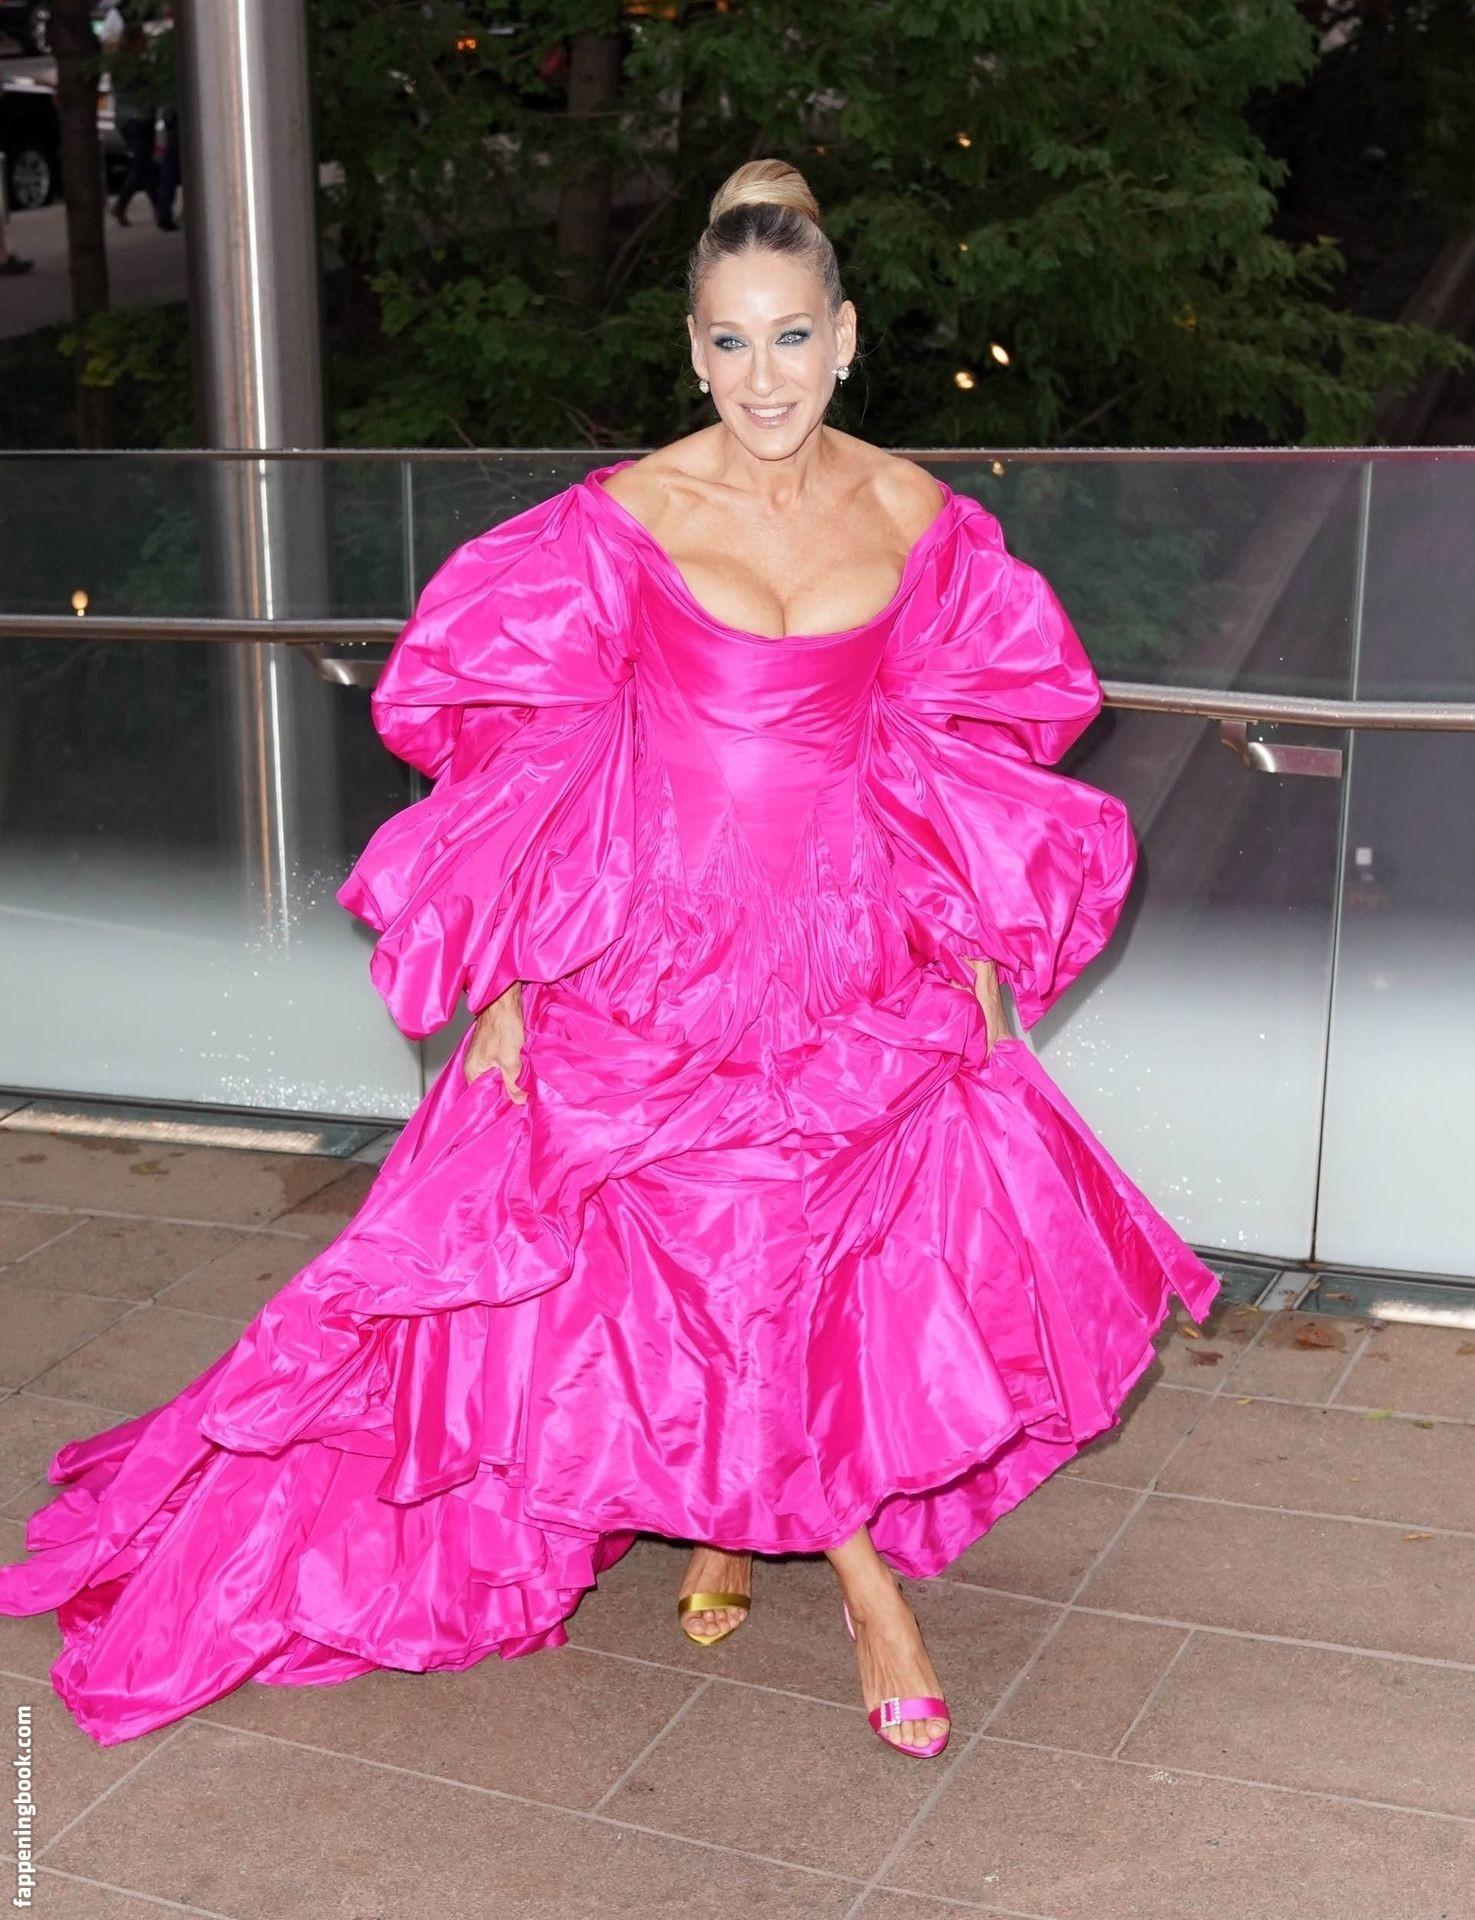 Sarah Jessica Parker Paparazzi Great Cleavage Photos